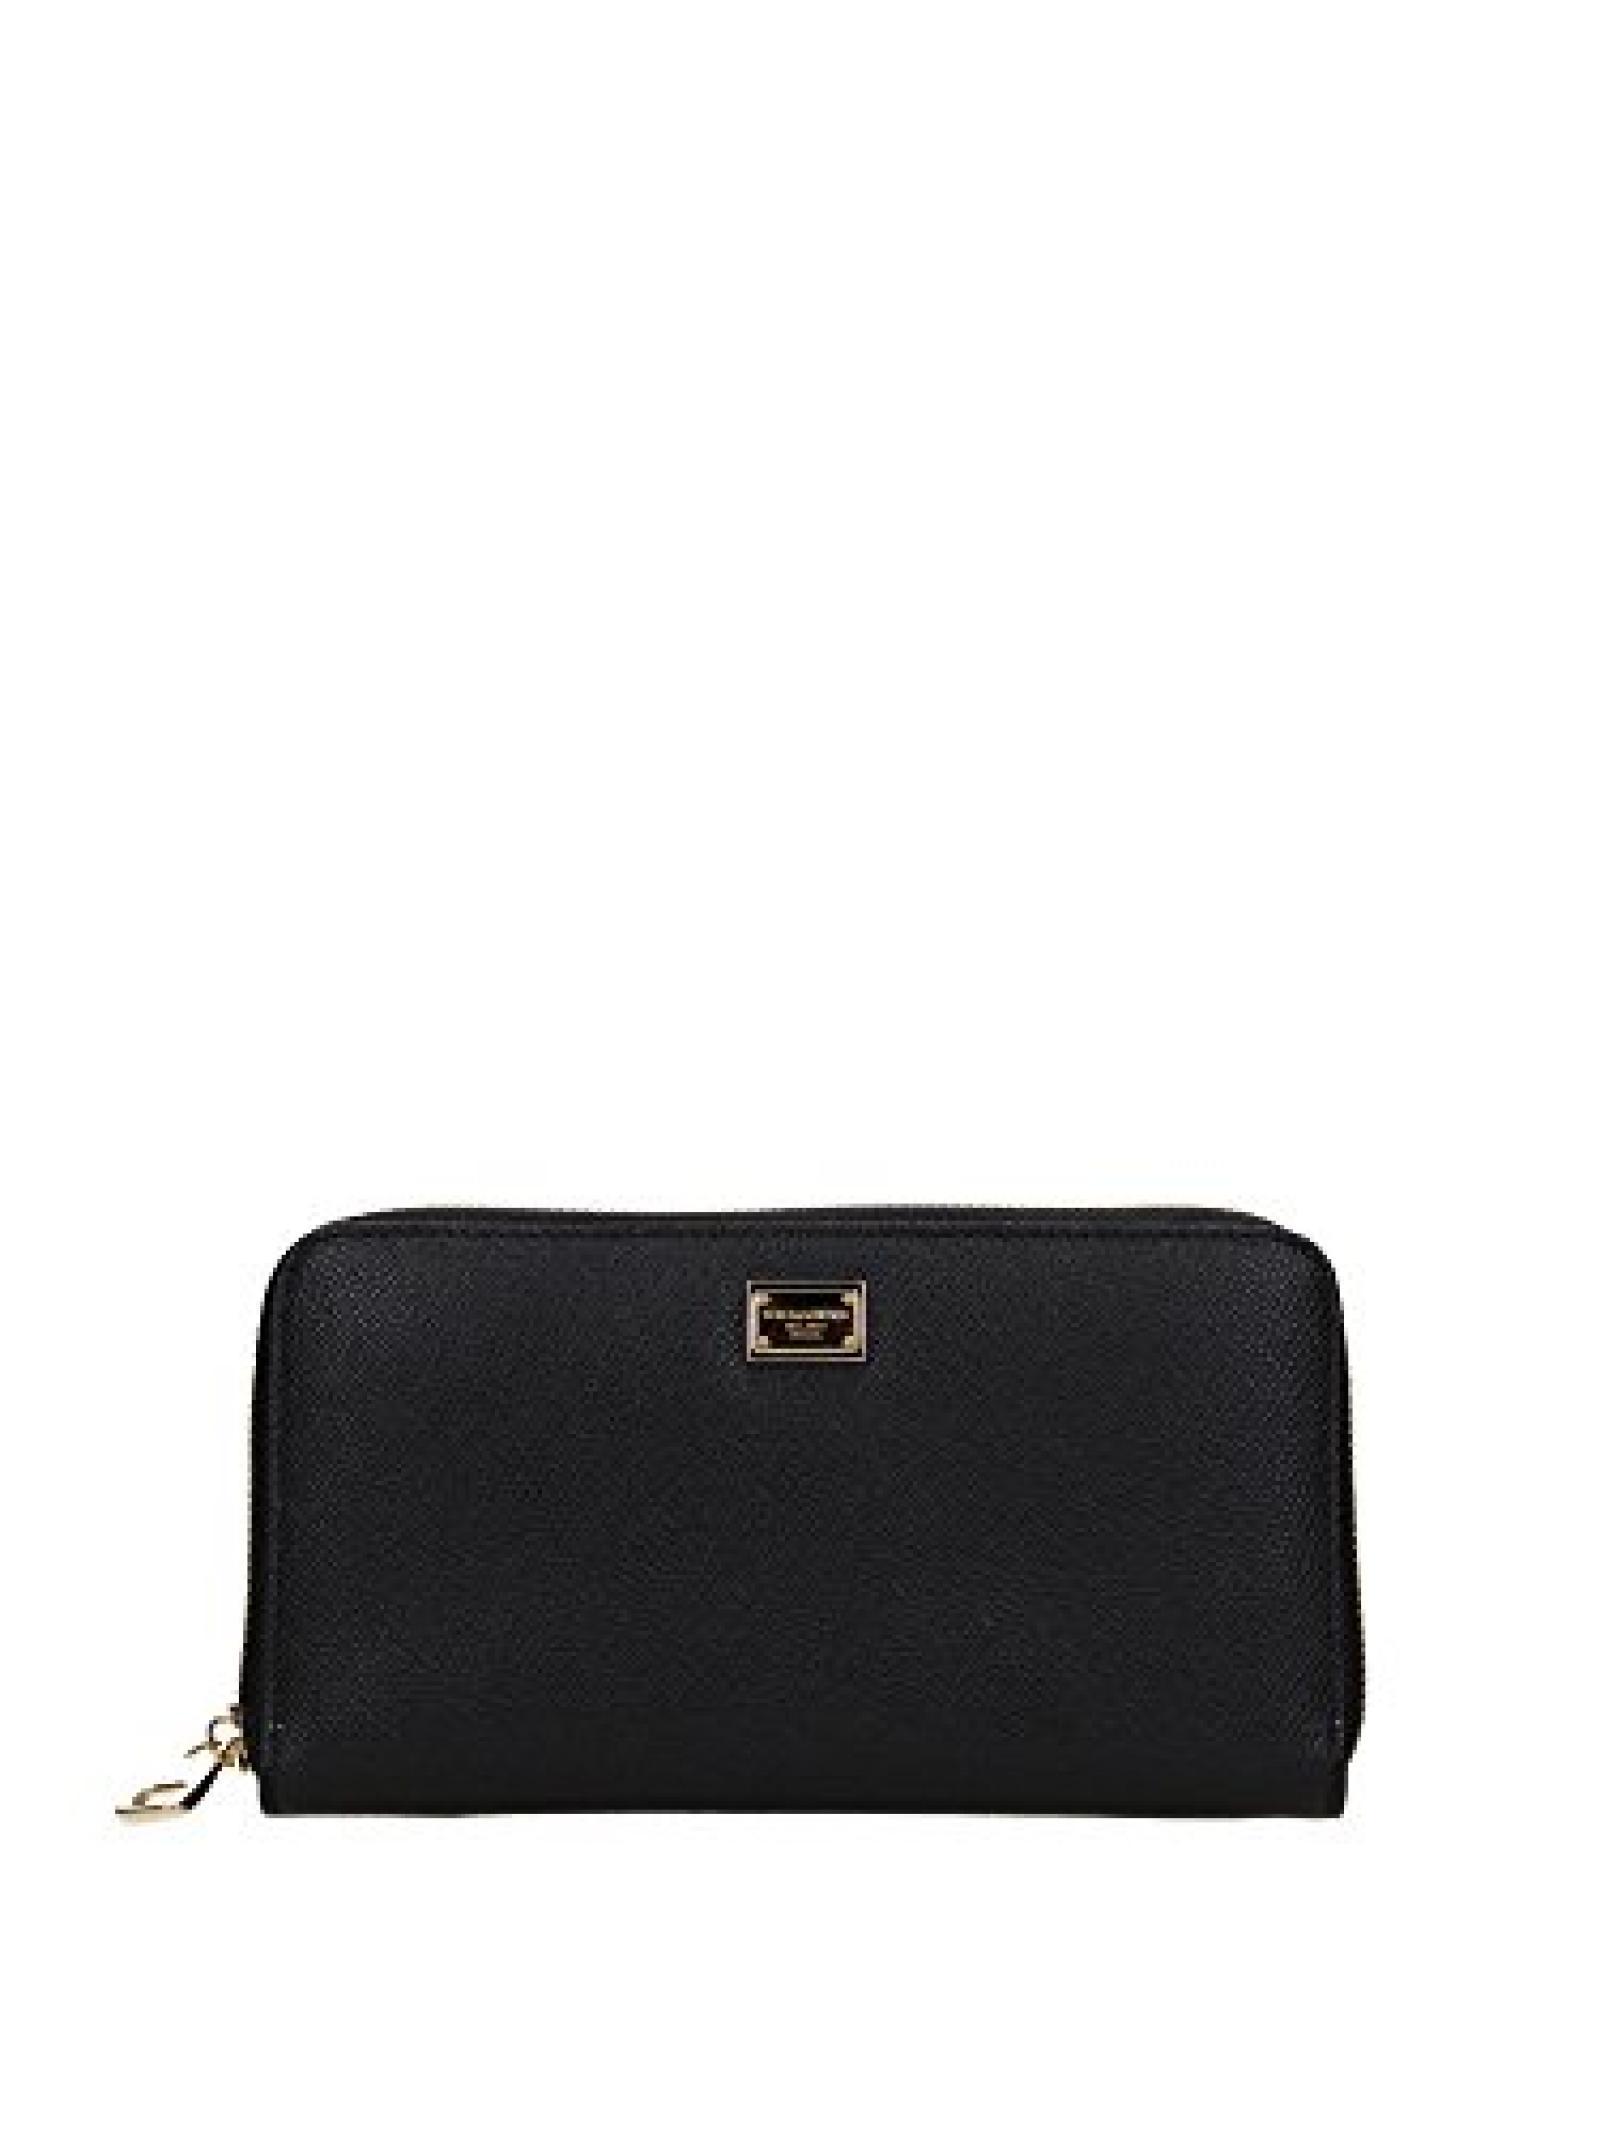 BI0473A100180999 Dolce&Gabbana Brieftaschen Damen Leder